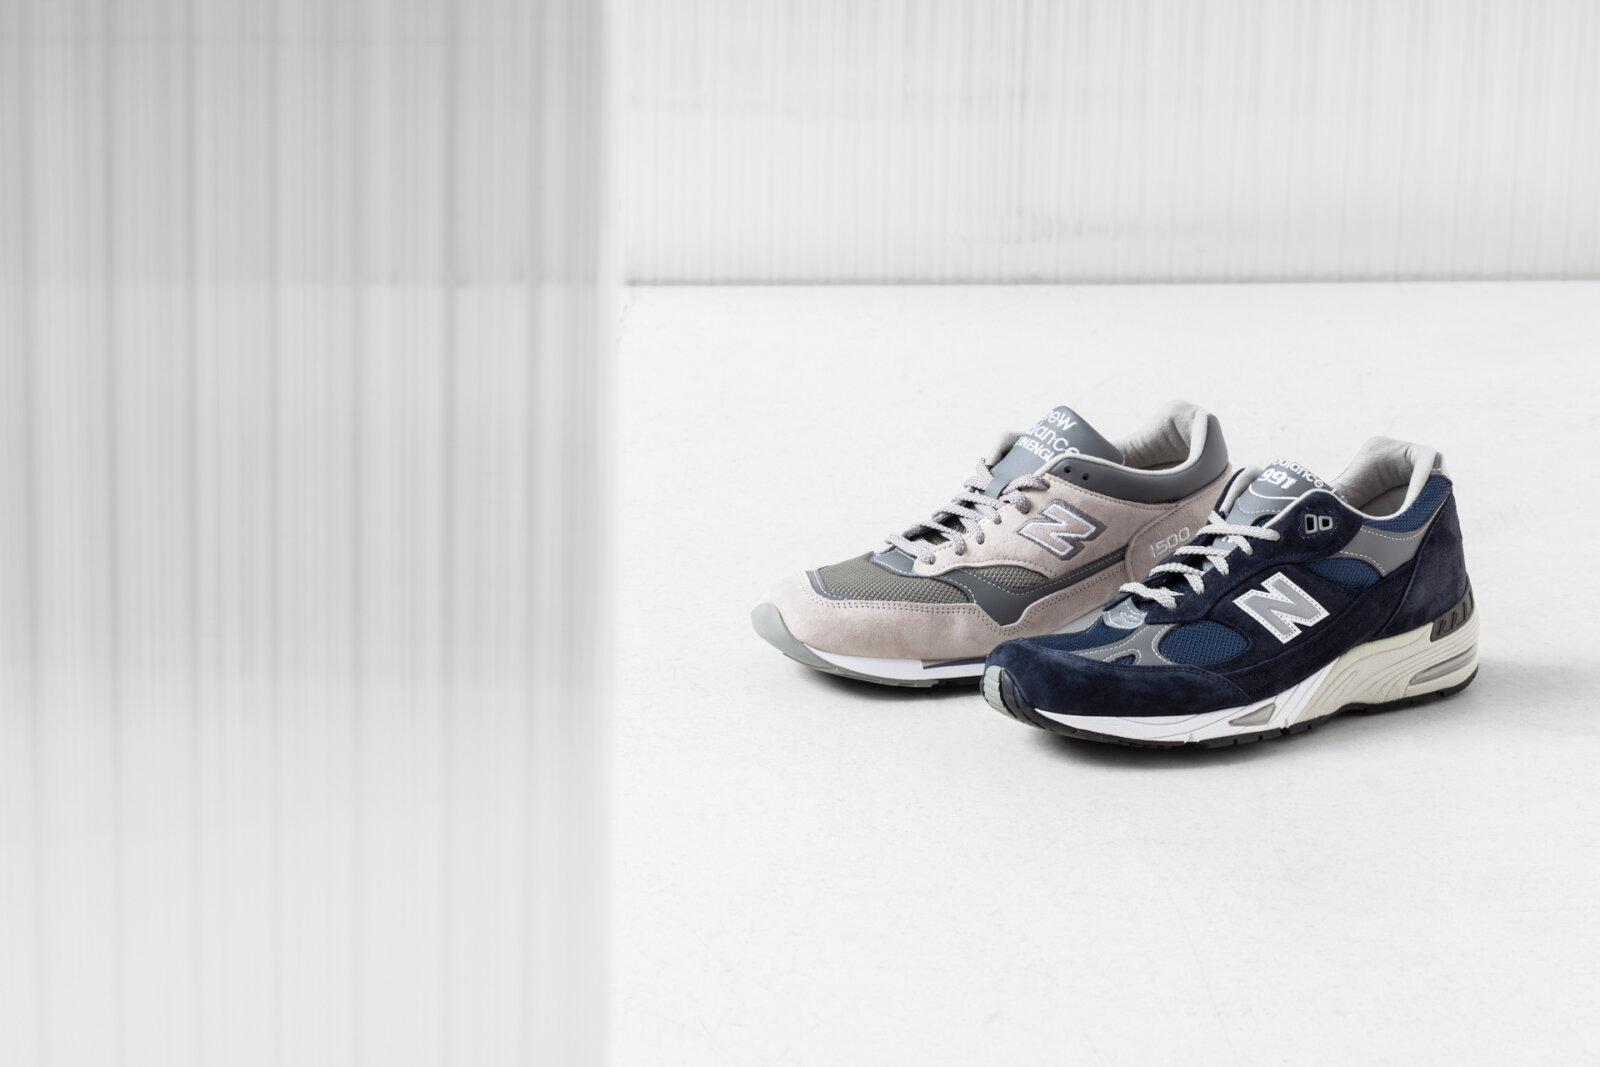 Reebok | Nike | Adidas | Salomon Integrated Online Store